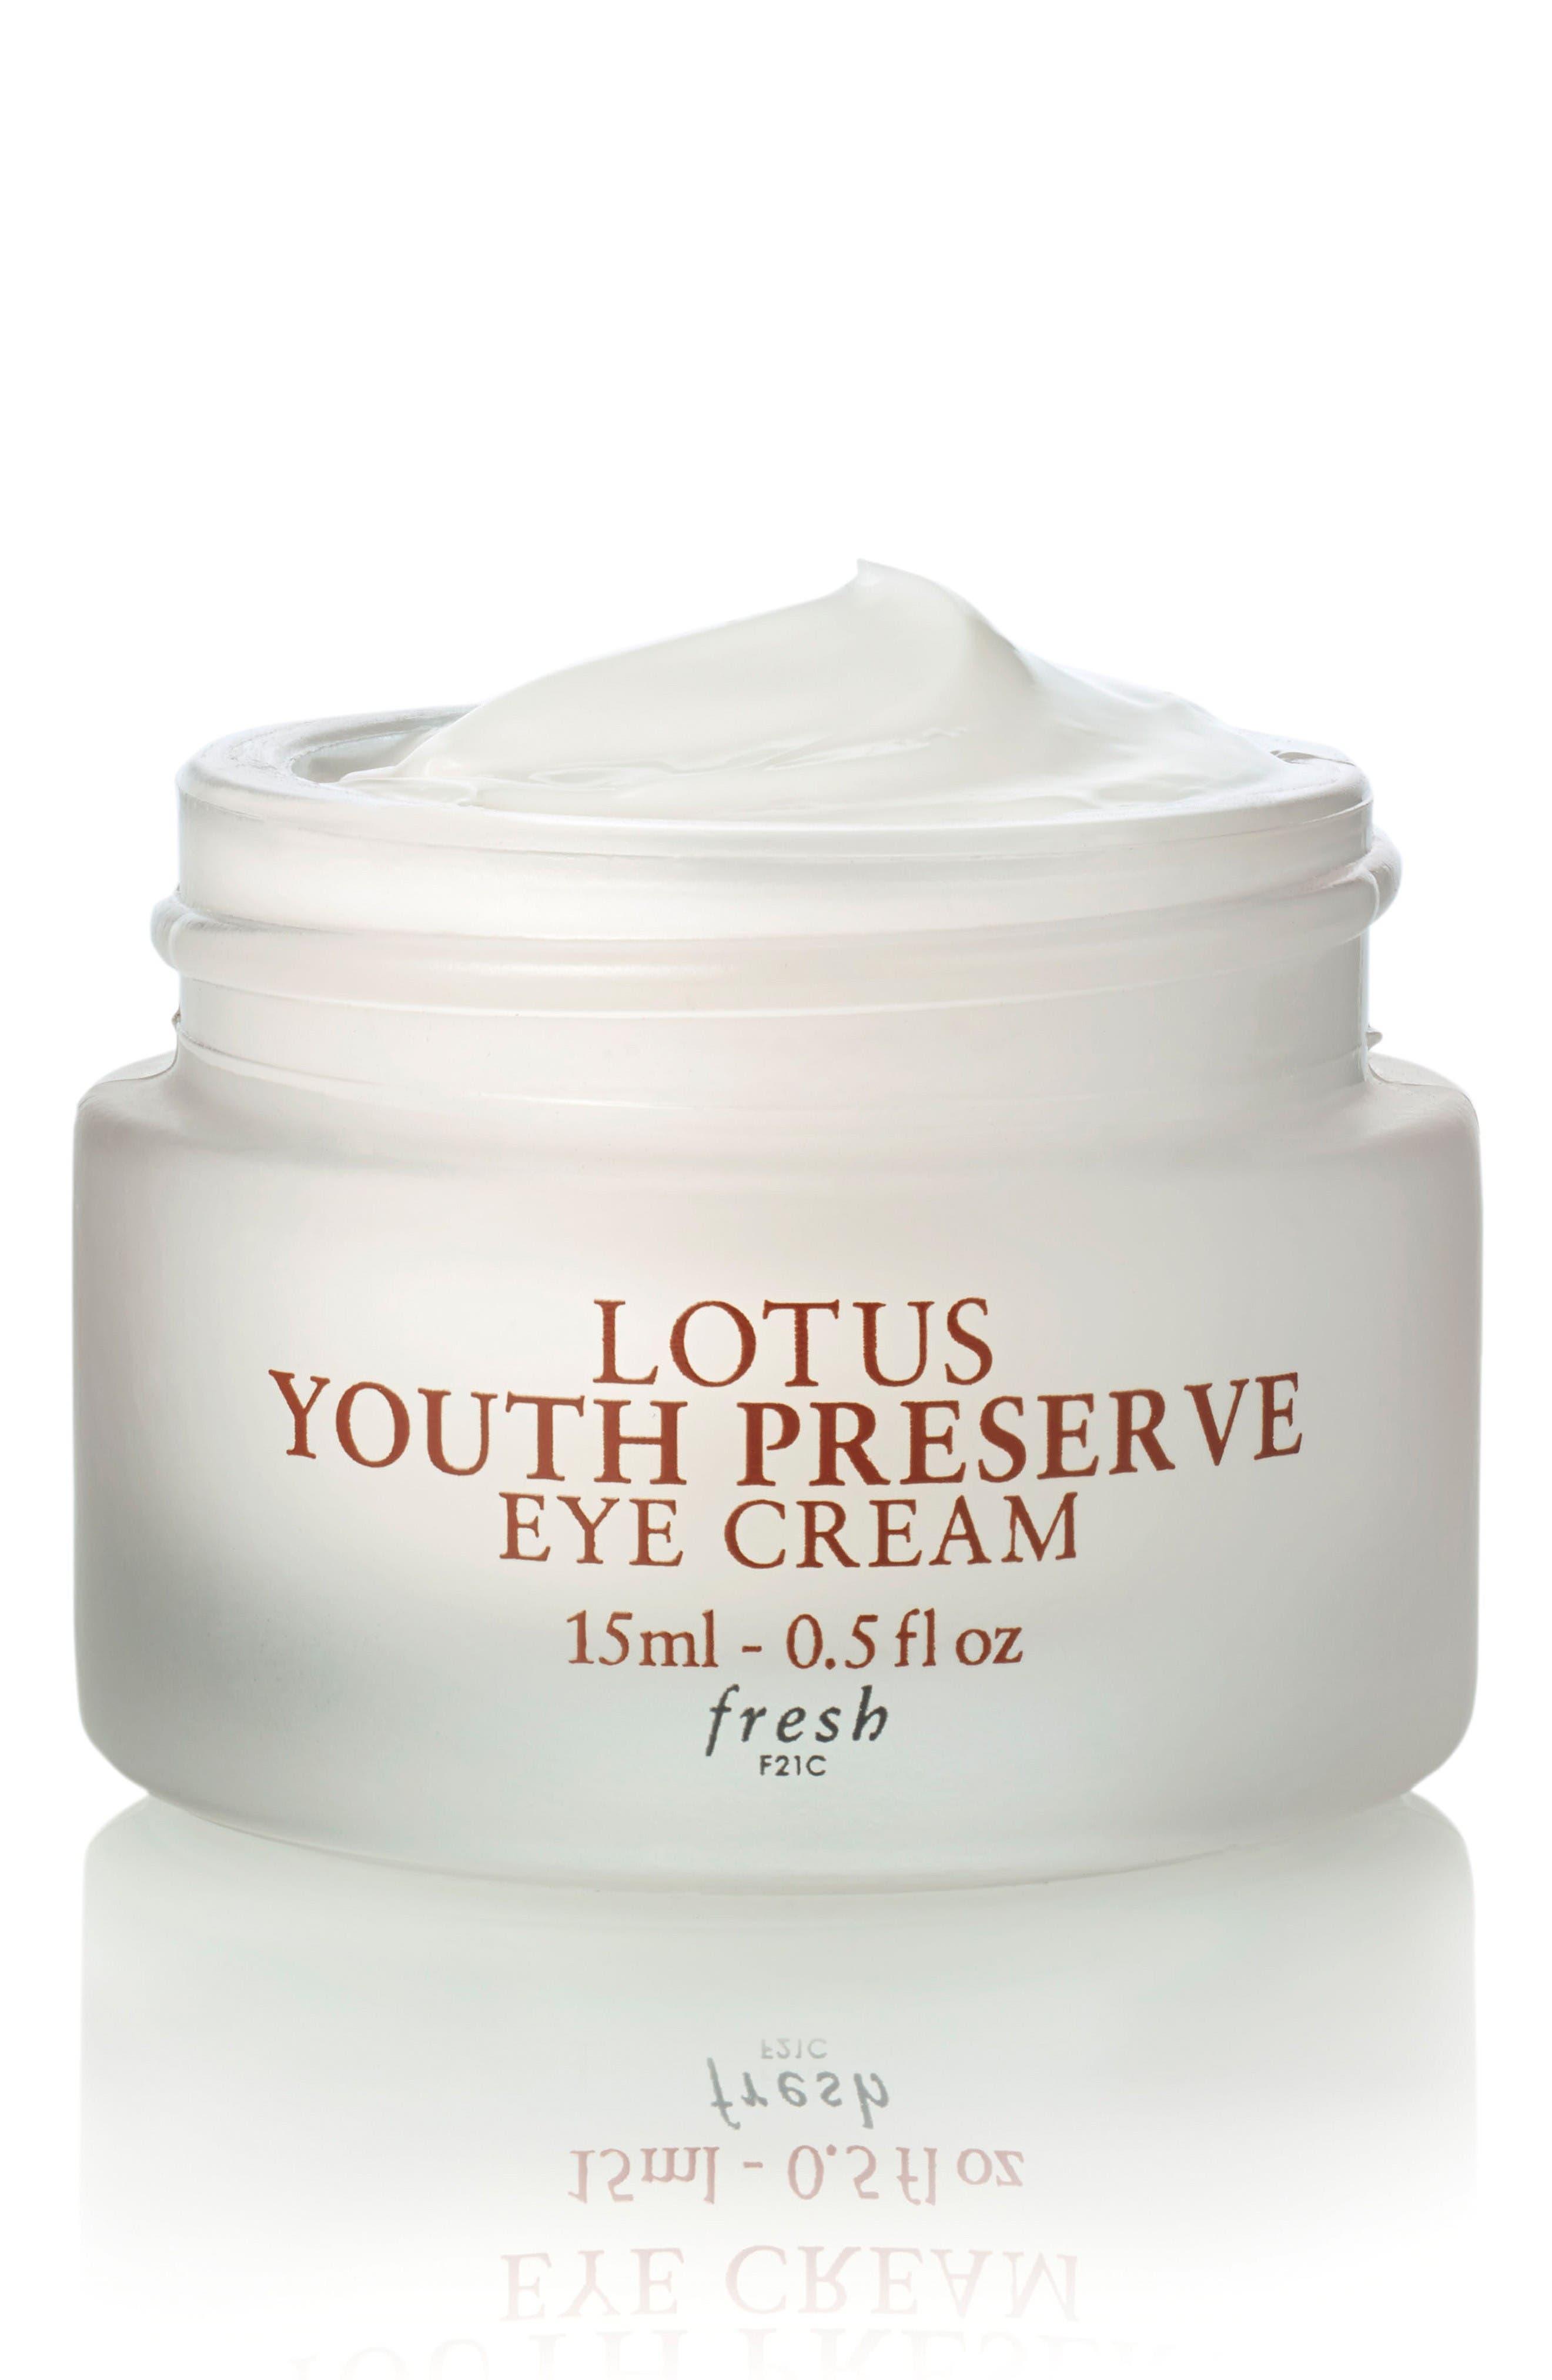 Lotus Youth Preserve Eye Cream,                             Main thumbnail 1, color,                             No Color